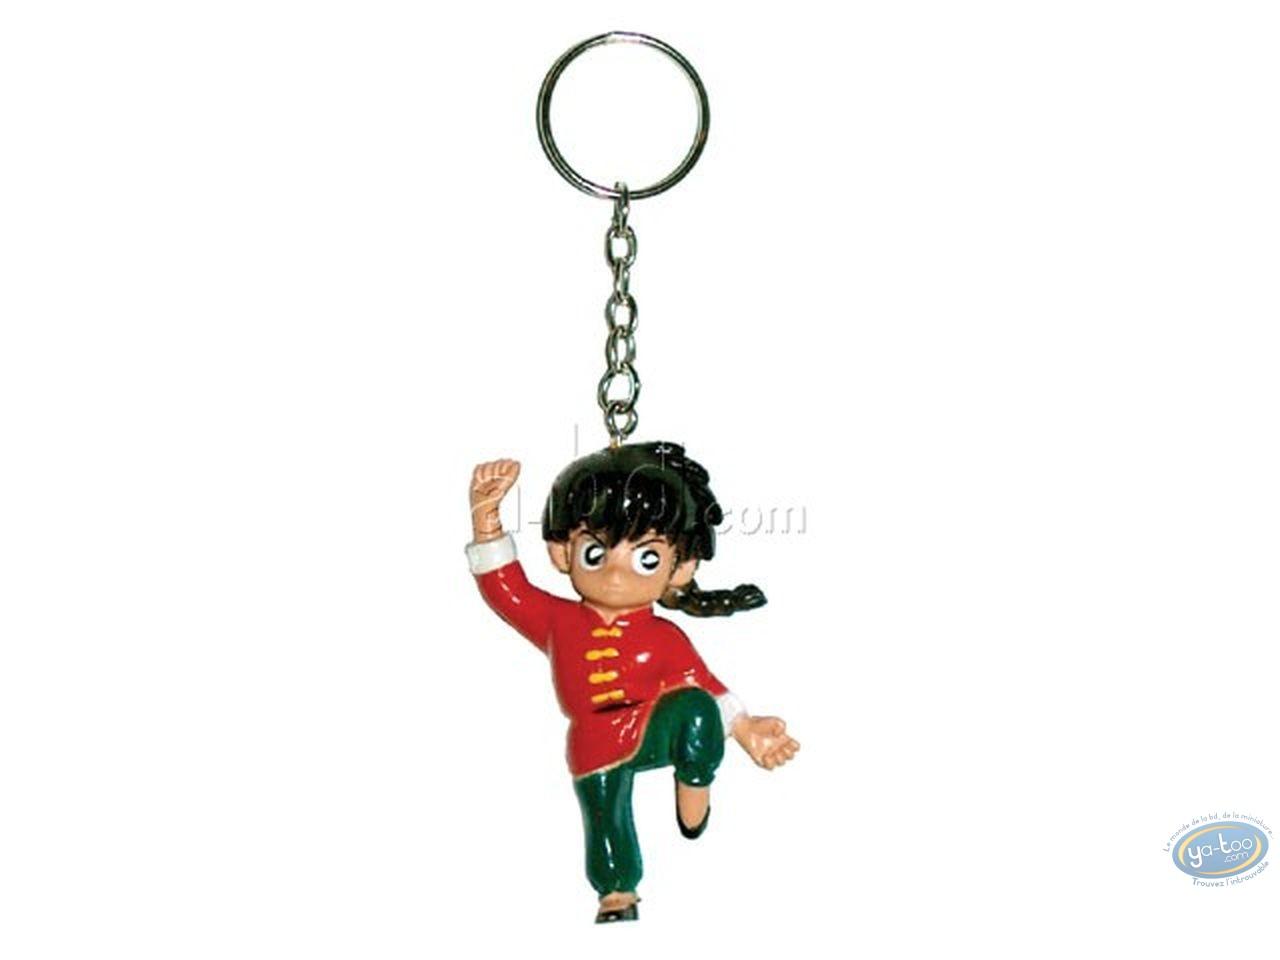 Keyring, Ranma 1/2 : Key ring, Ranma 1/2 : Saotome Ranma boy